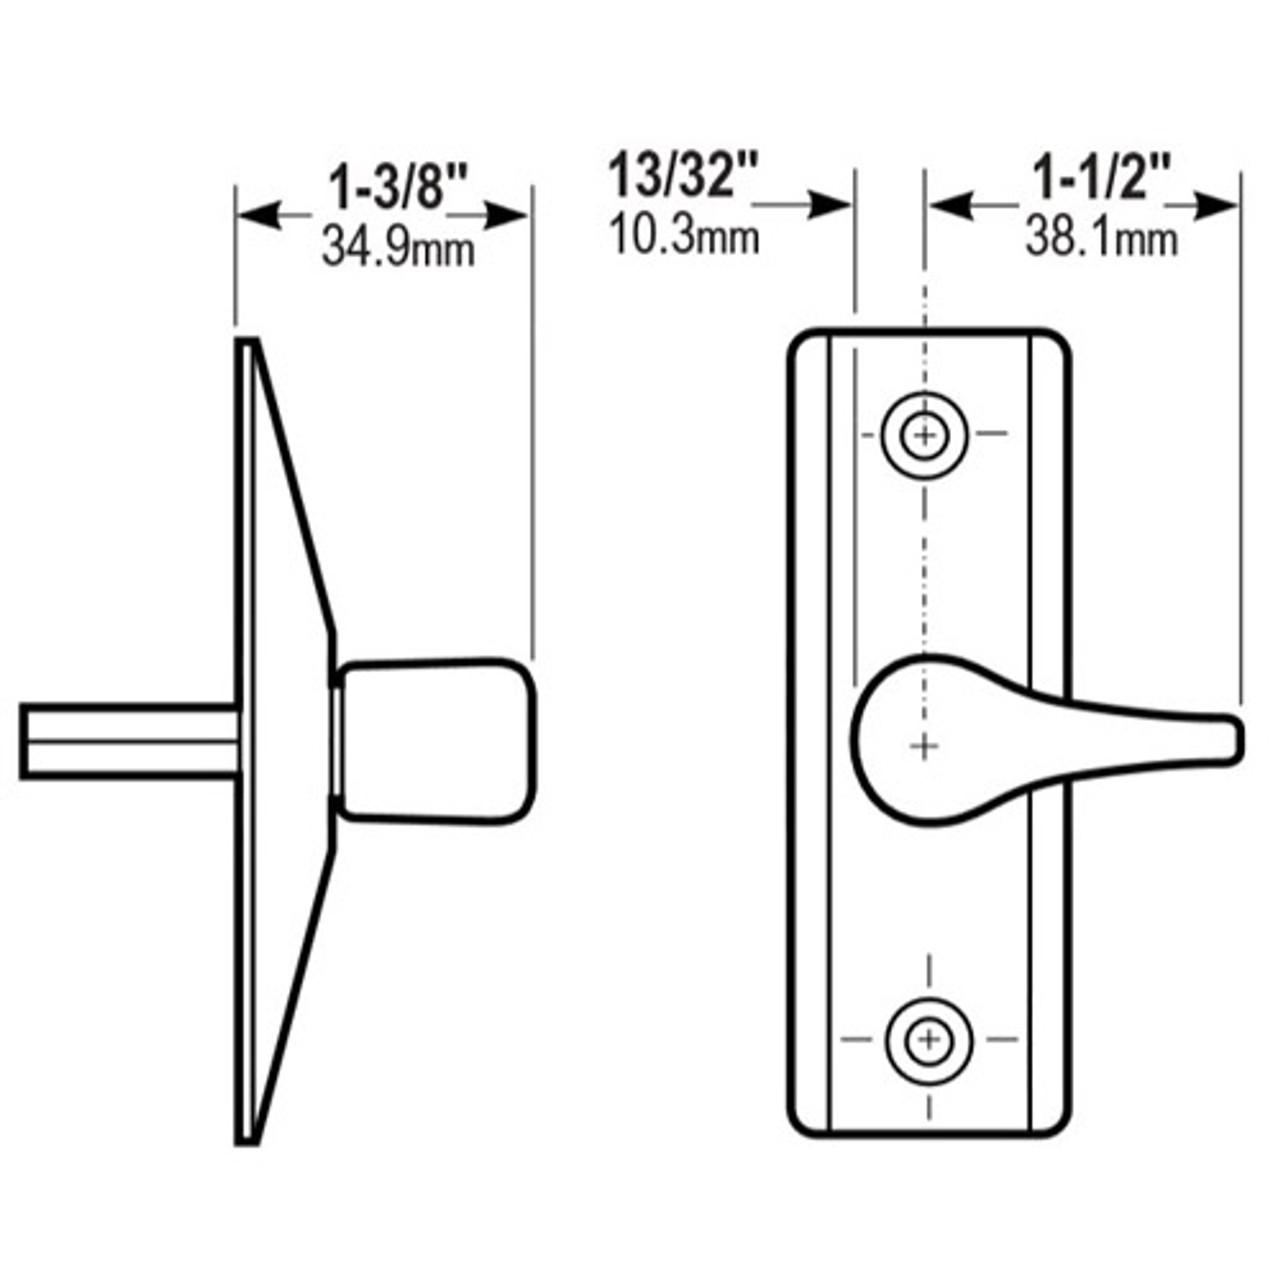 4565-012-119 Adams Rite Deadlatch Handle Dimensional View